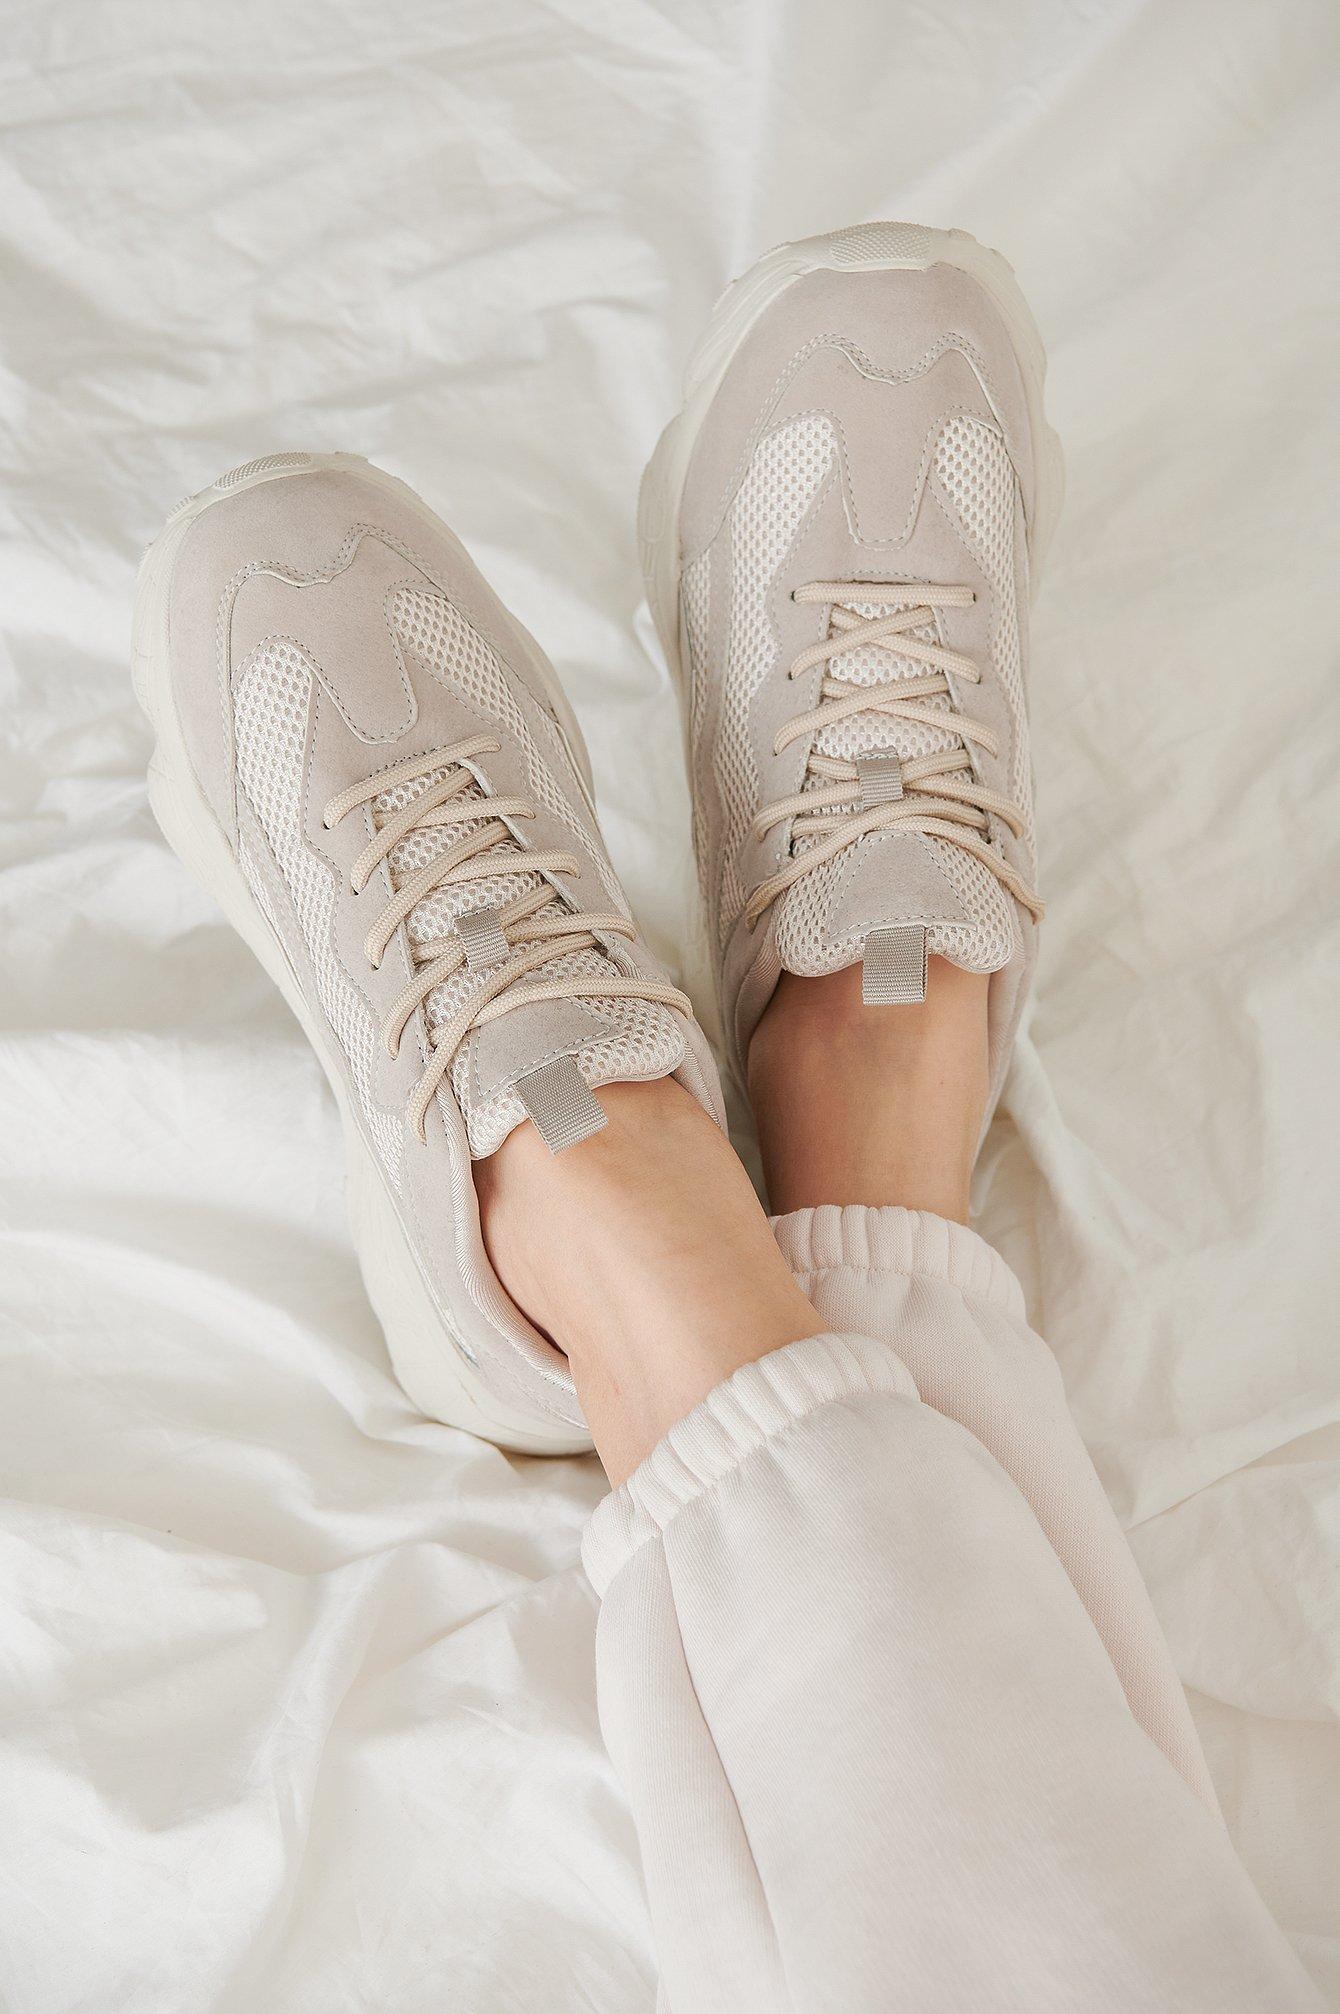 na-kd shoes -  Trainingsschuhe Mit Reflektor-Detail - Beige